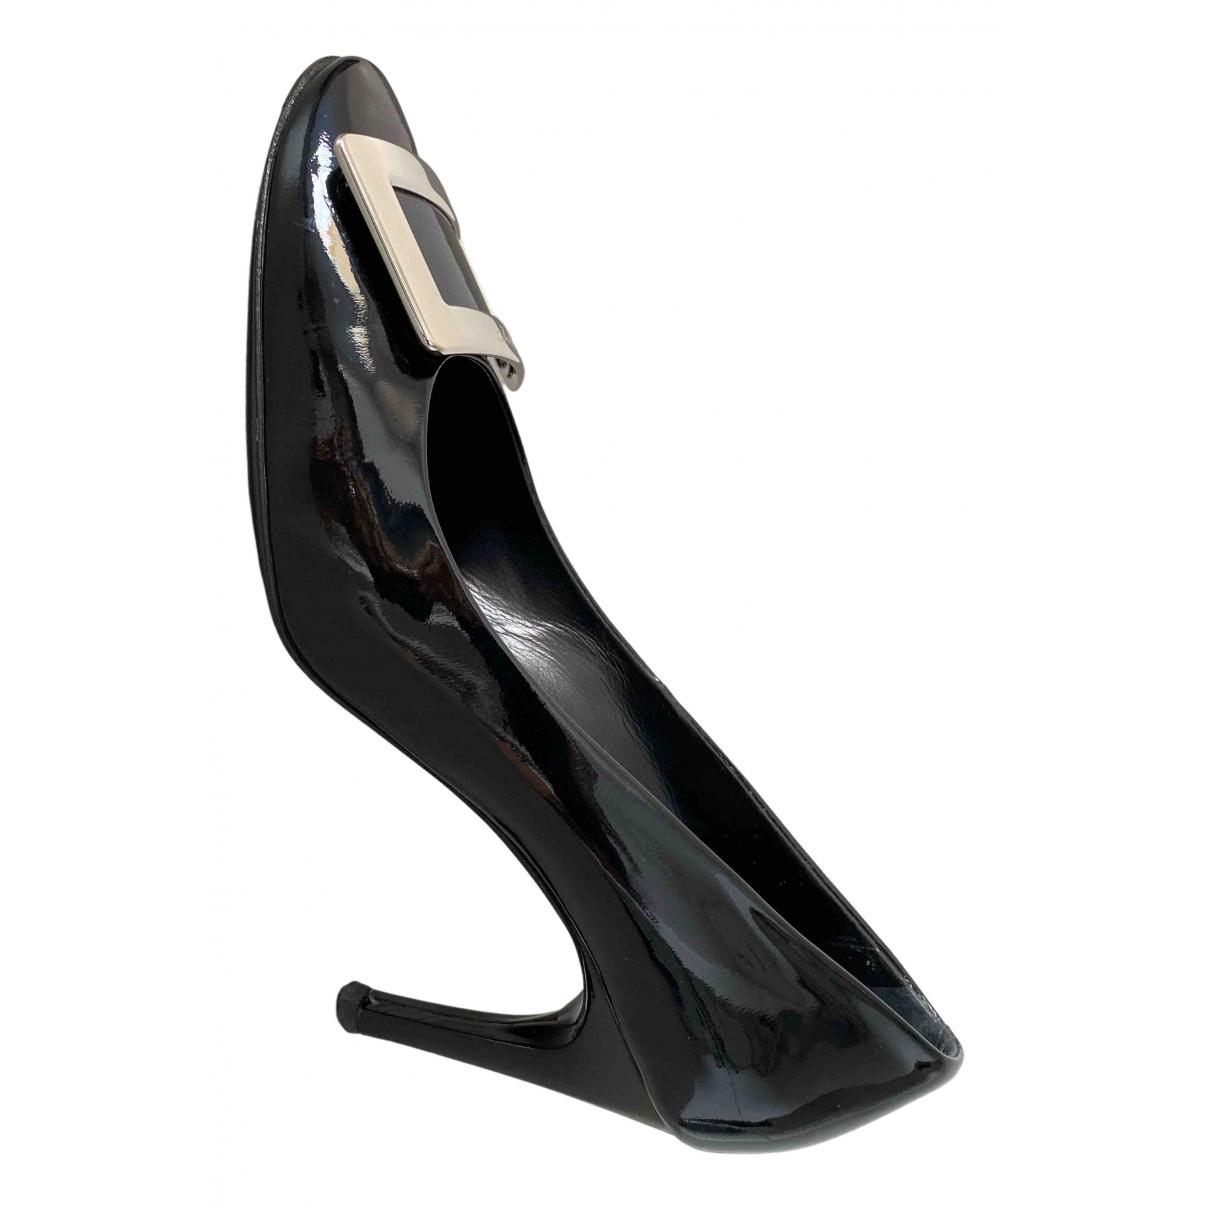 Roger Vivier Belle Vivier Black Patent leather Heels for Women 39.5 EU